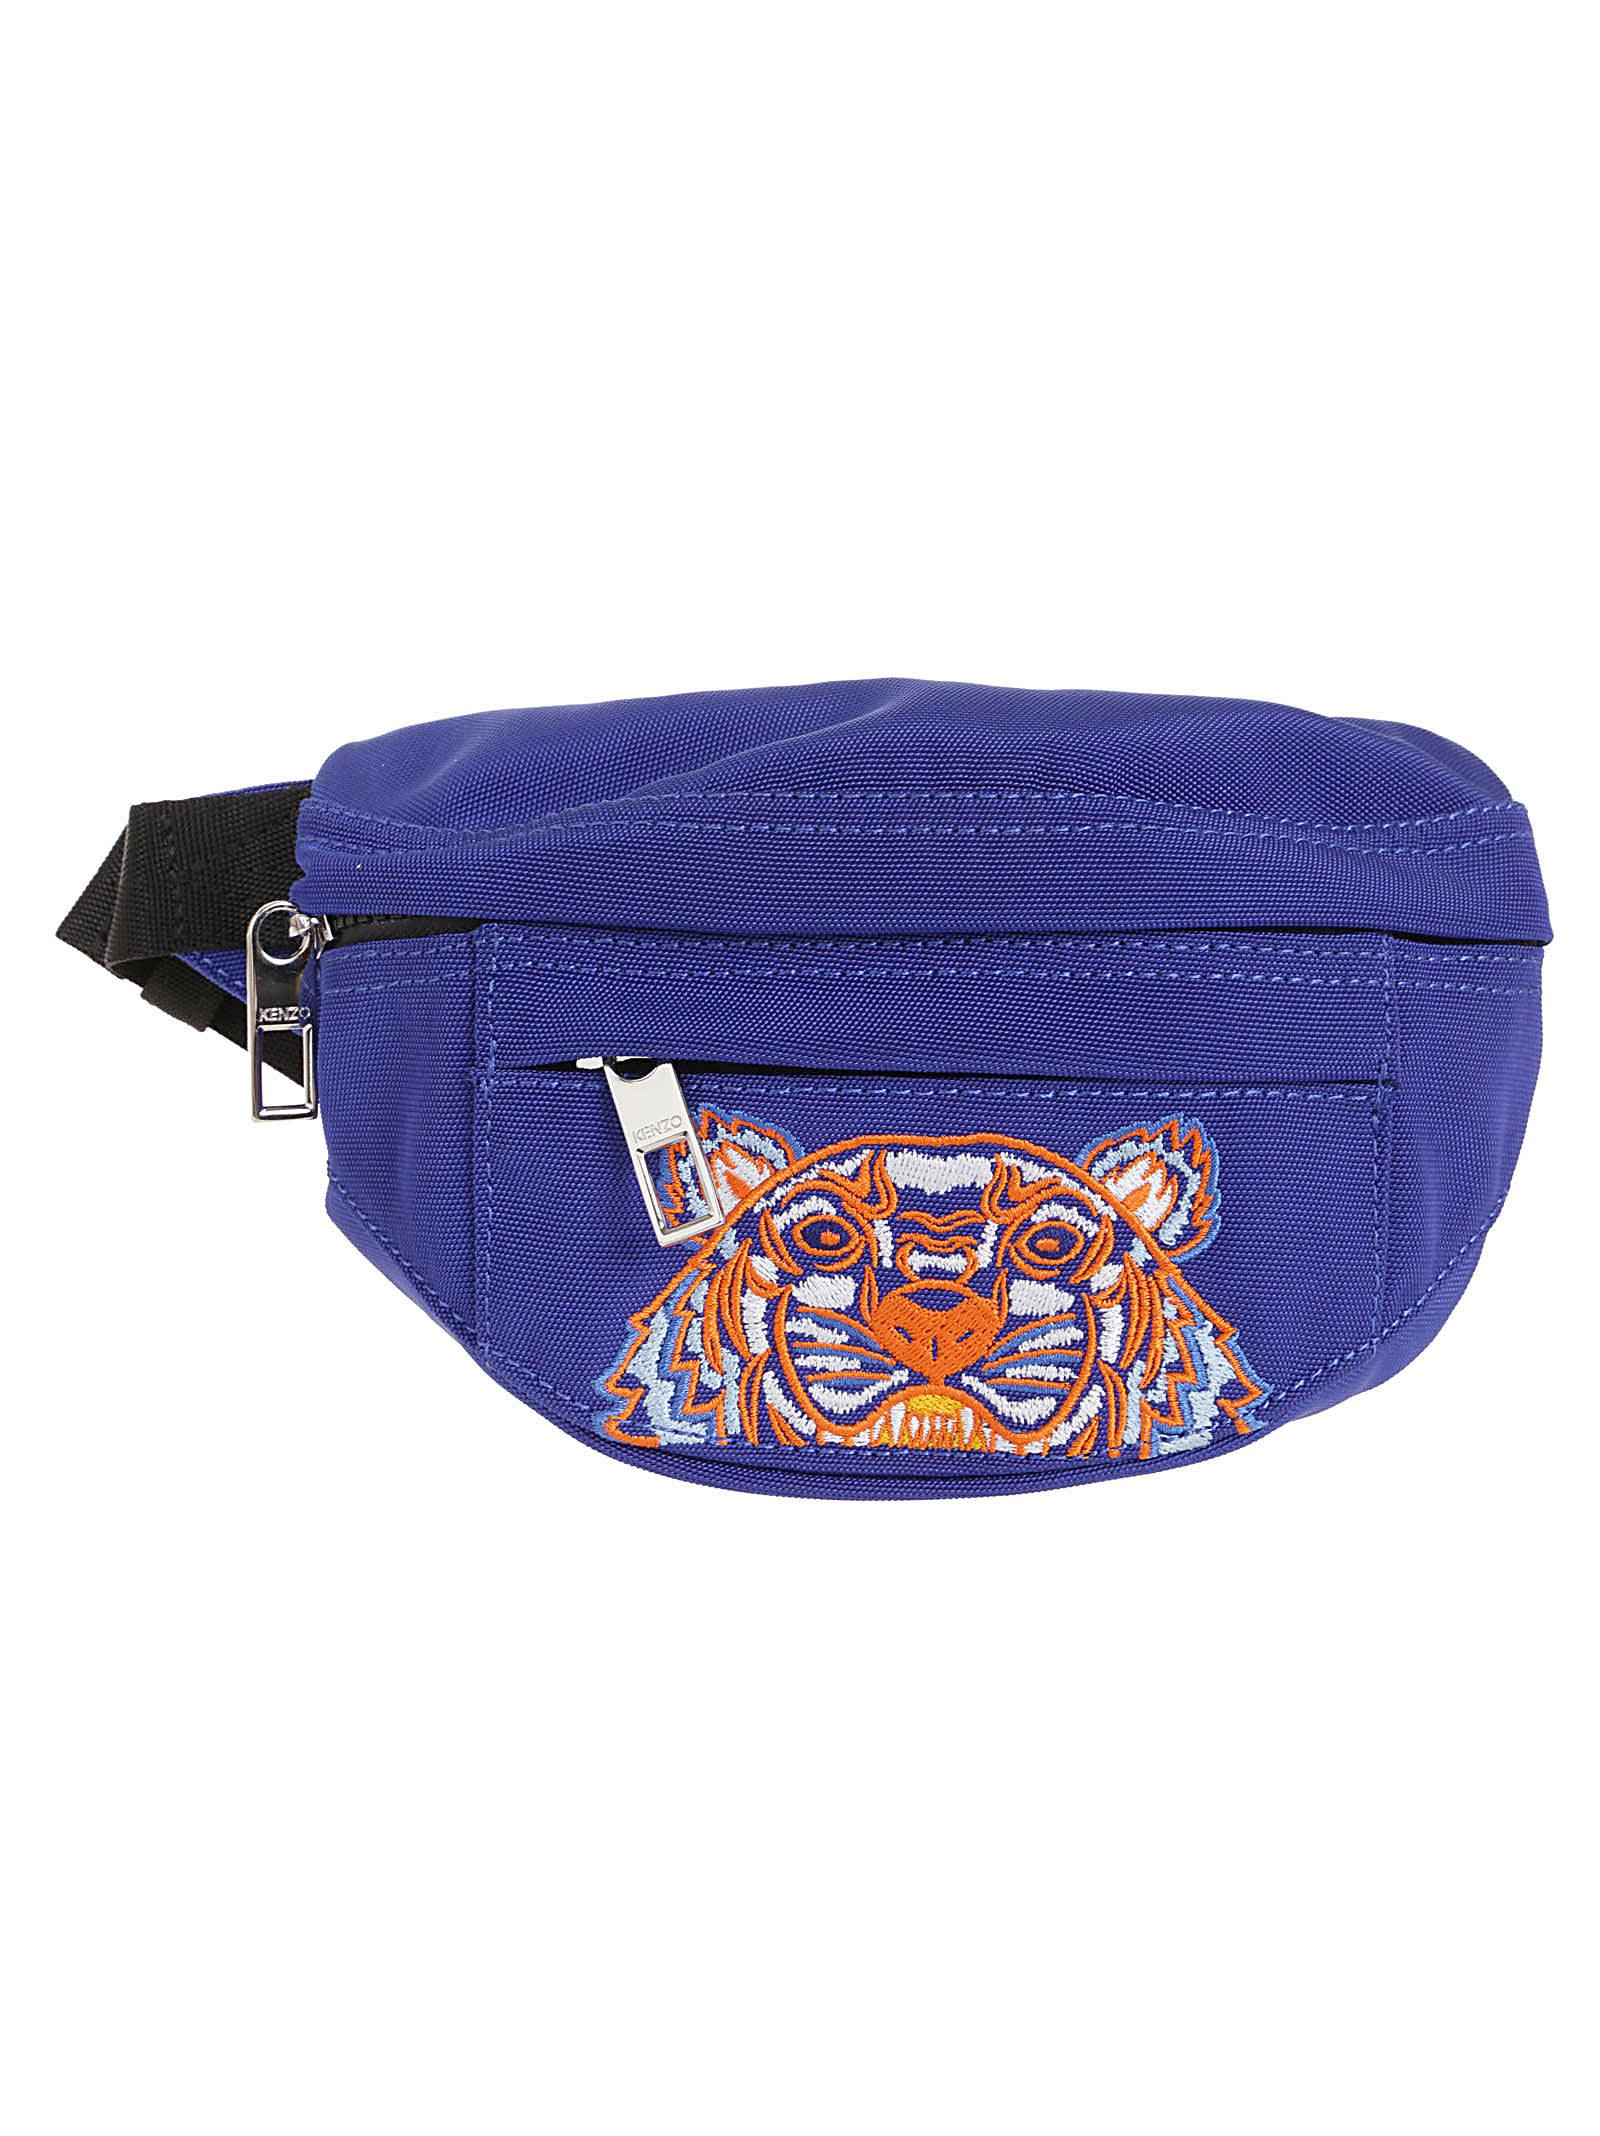 Kenzo Bags Kenzo Bumbag Mini